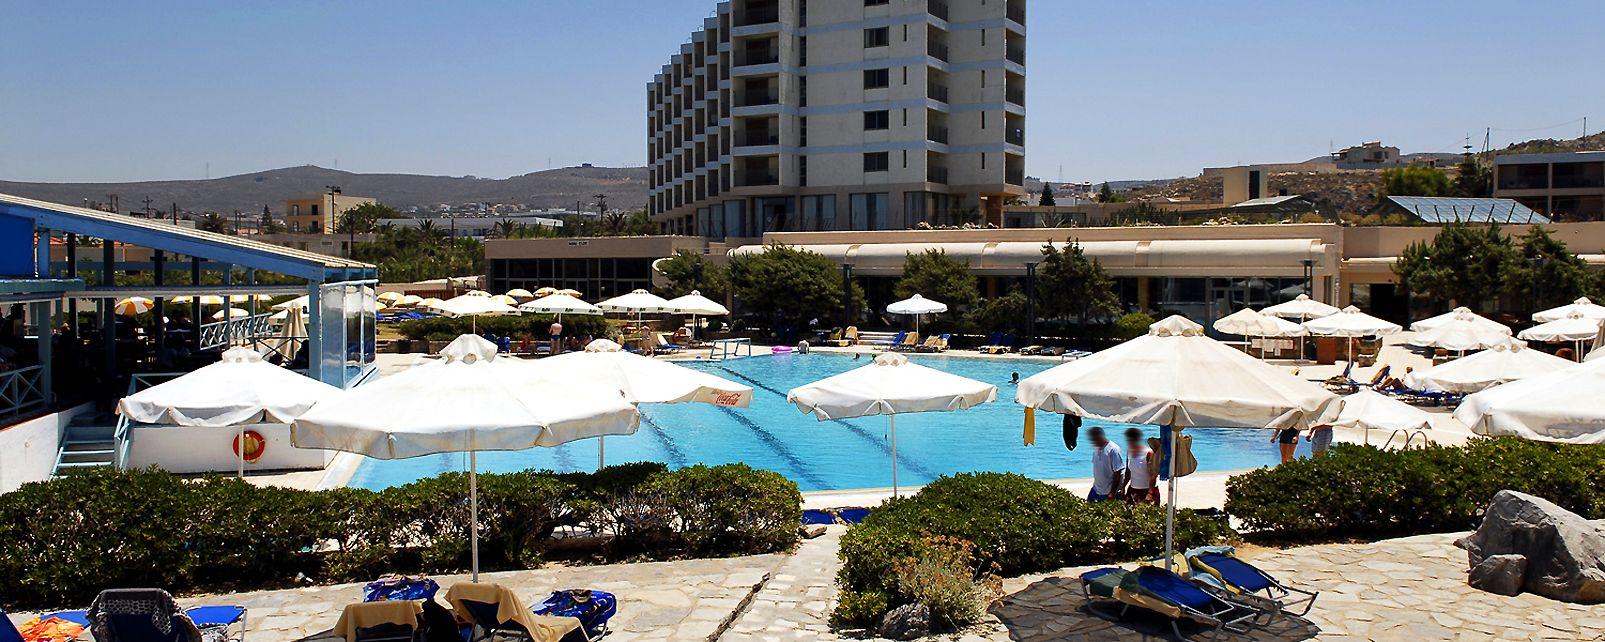 Hôtel Arina Sand Hotel